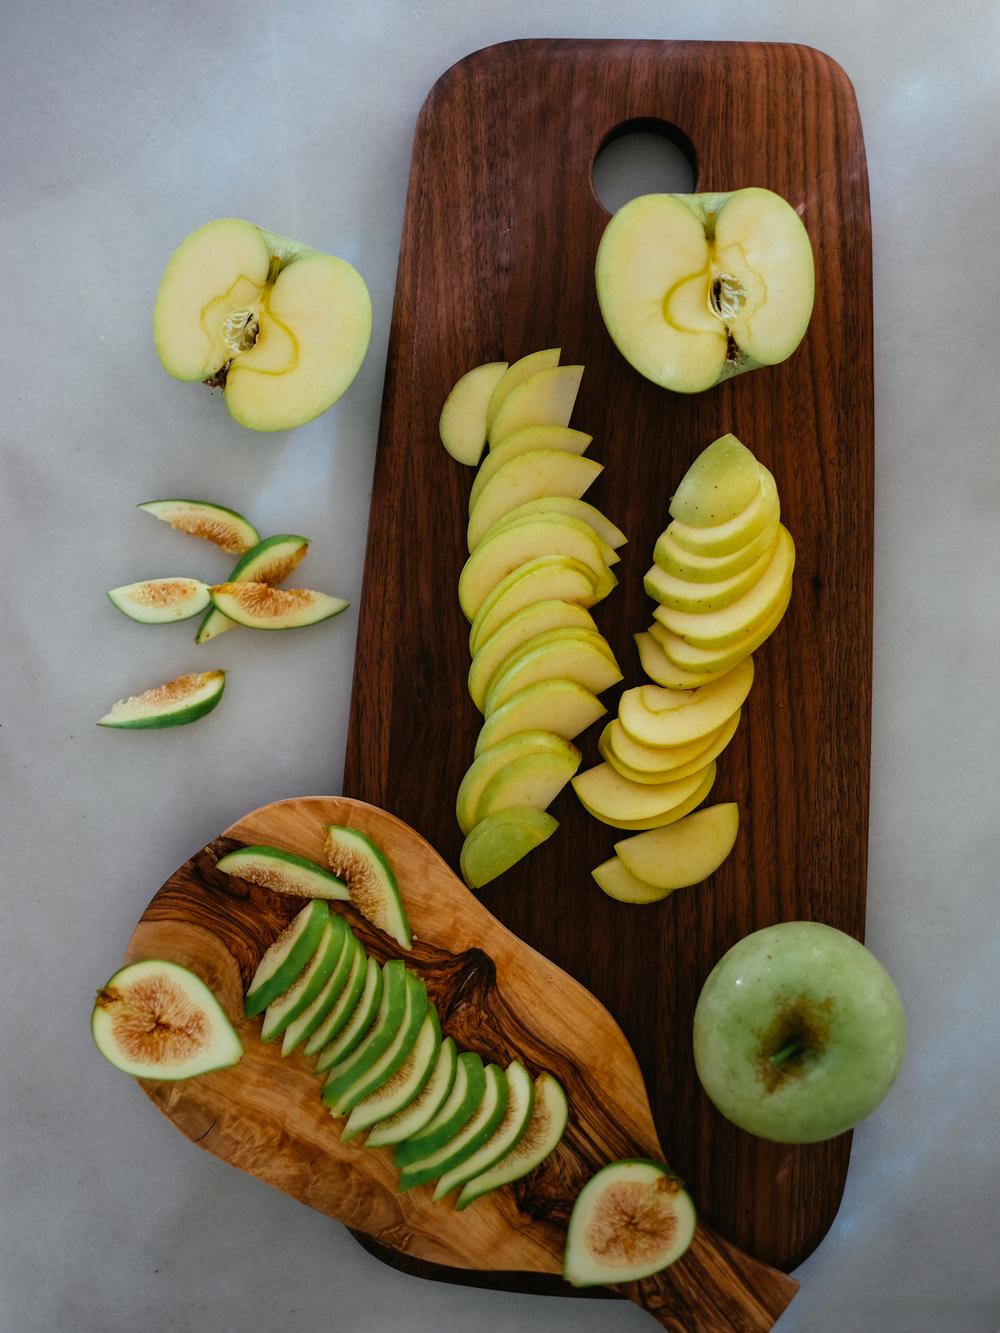 Spiced-Apple-Fig-Financiers-2.jpg